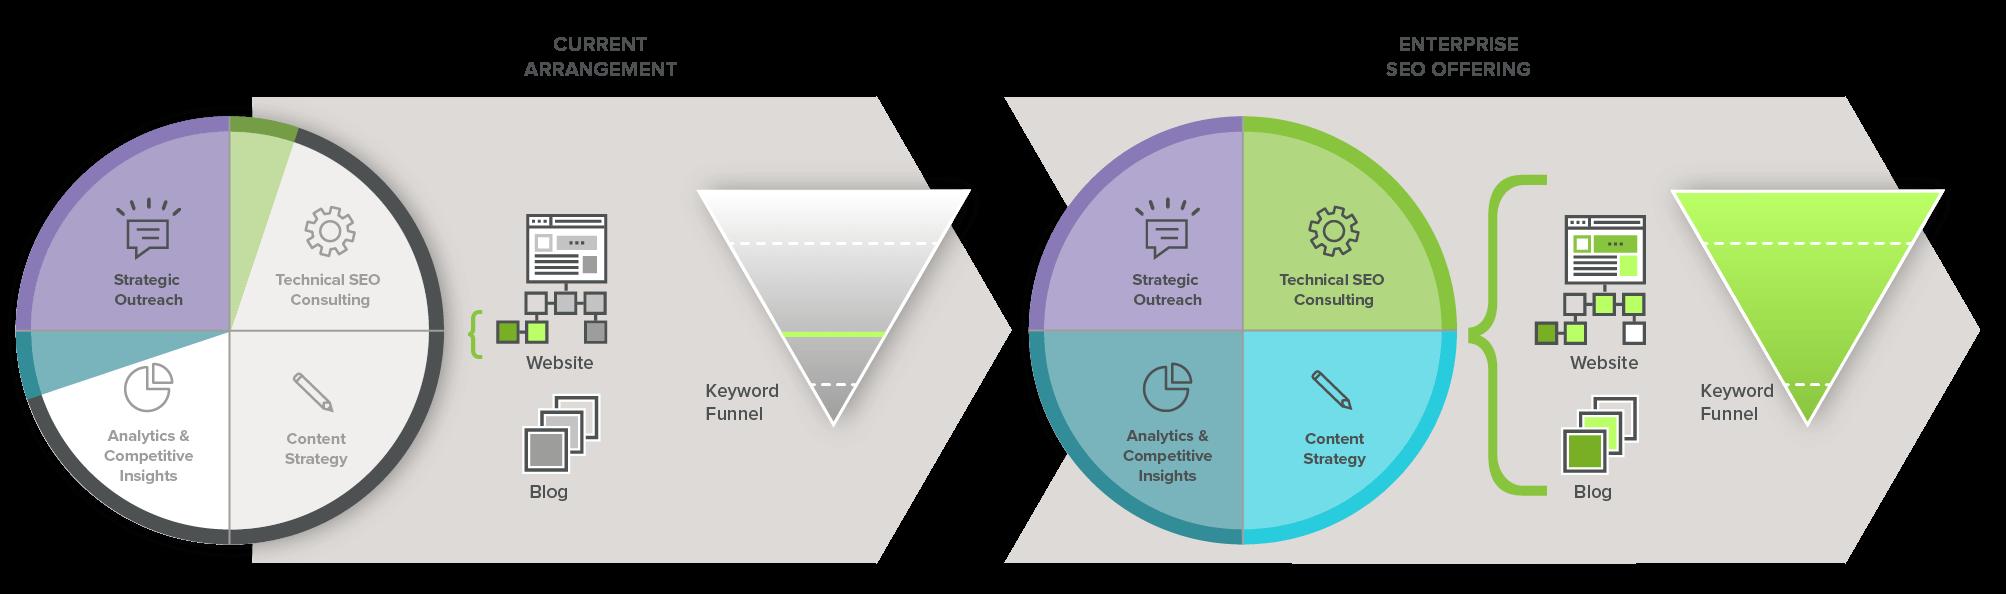 Enterprise SEO as a holistic solution